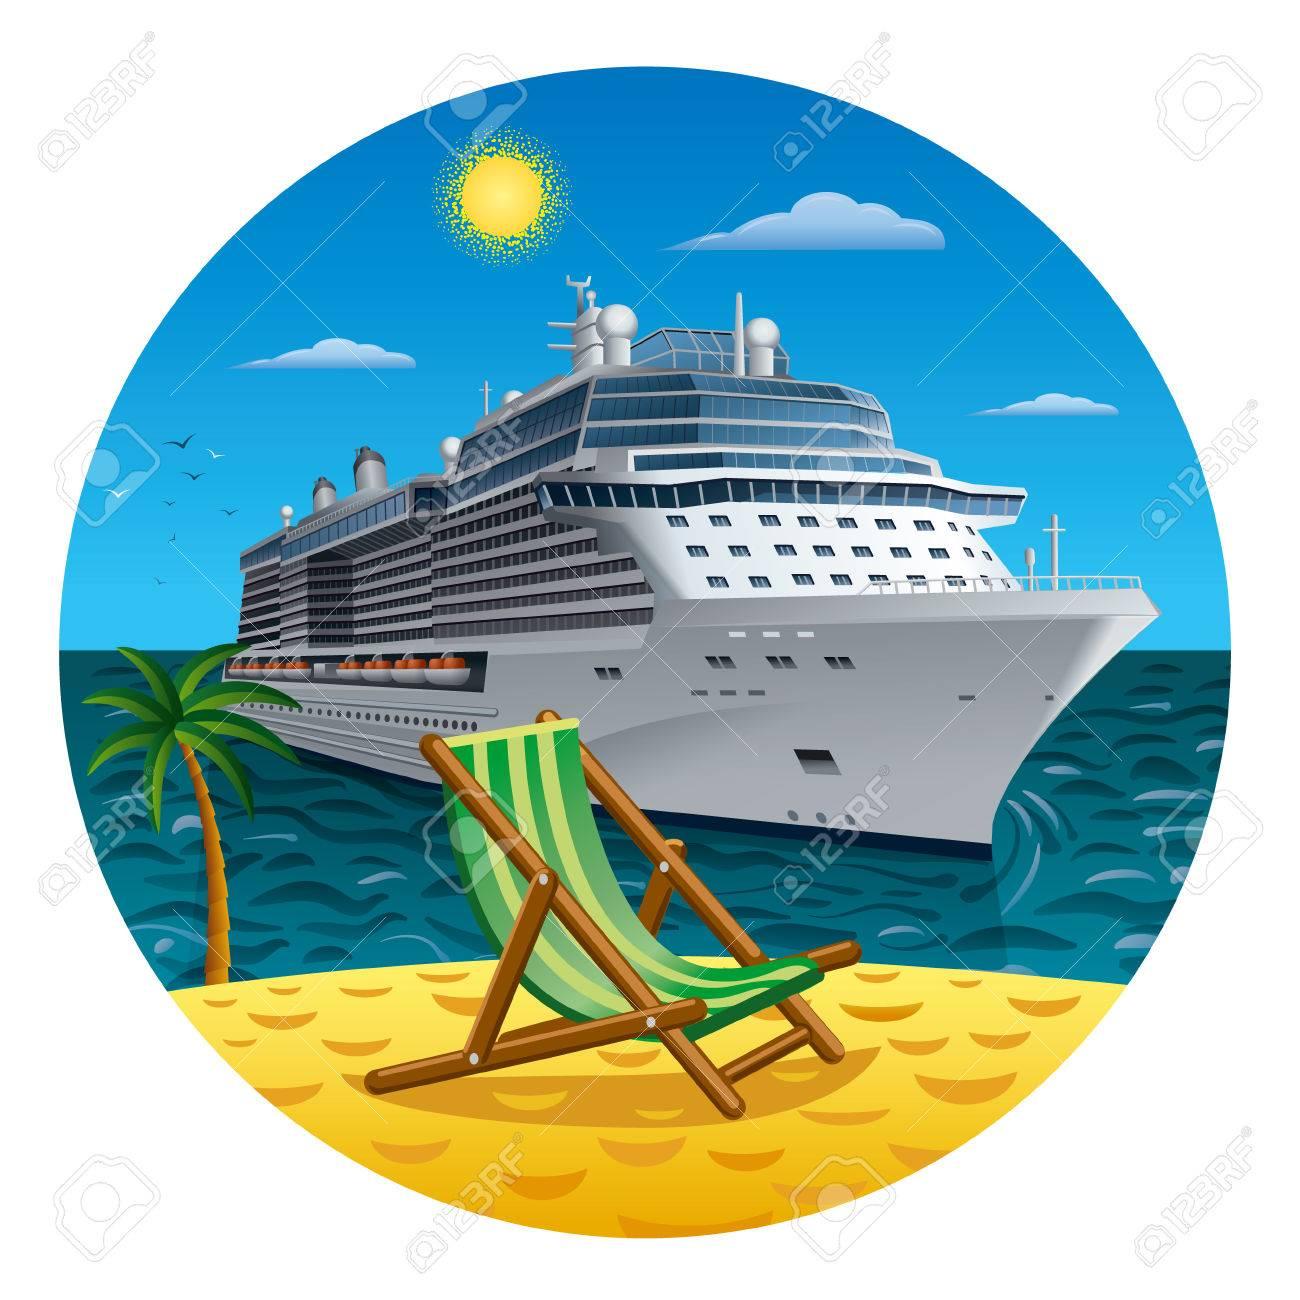 island journey - 38898042